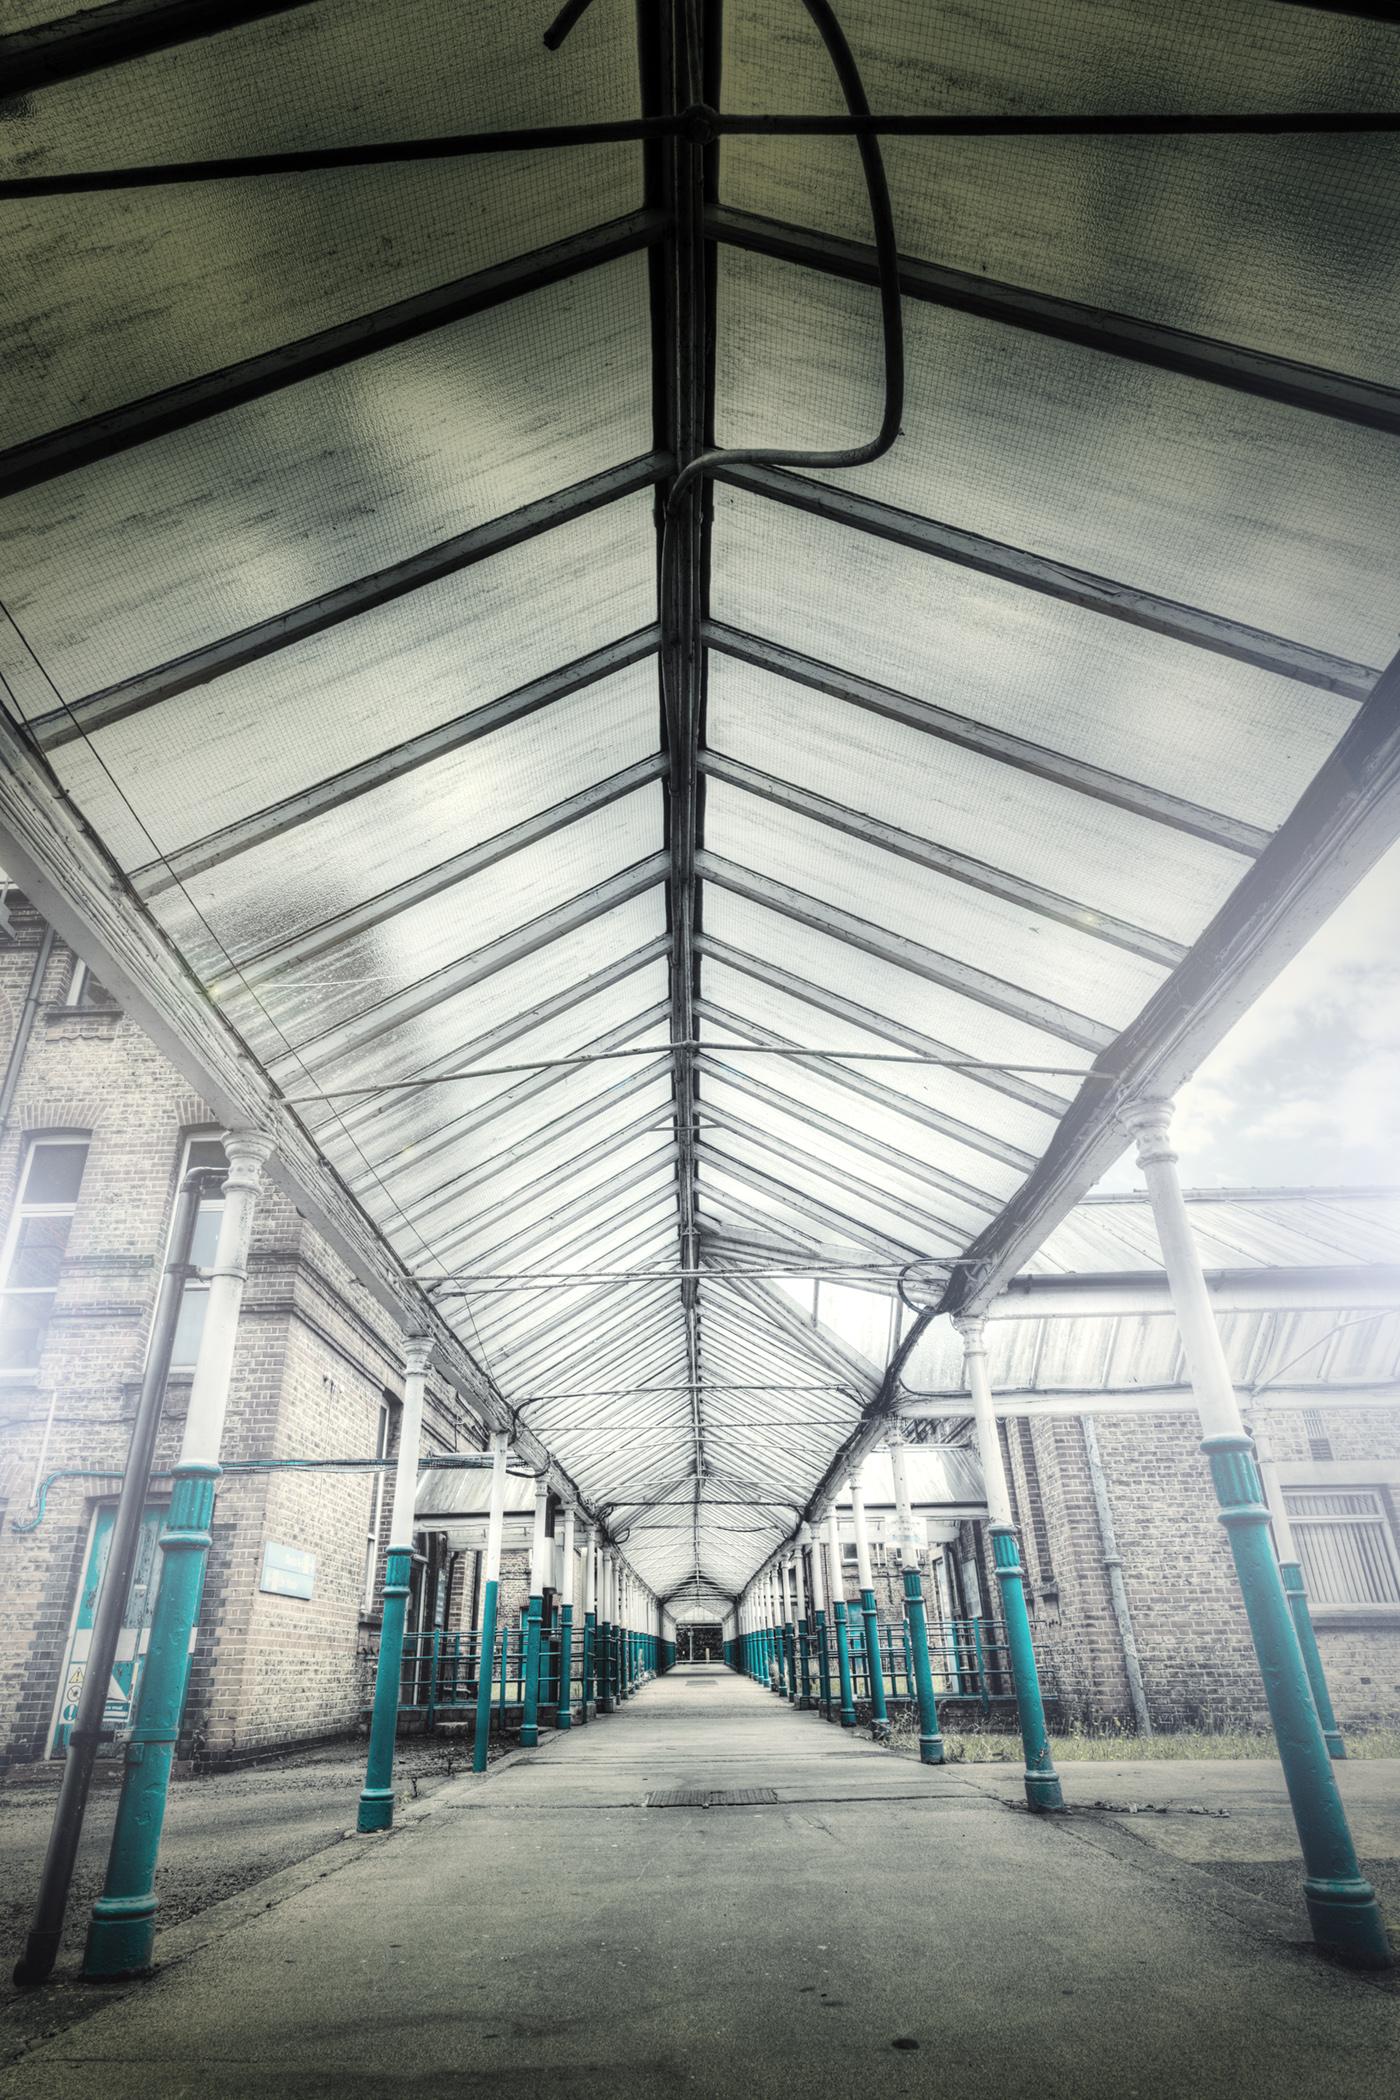 London_Portrait_Photographer_Image_Editing-Test-006.jpg